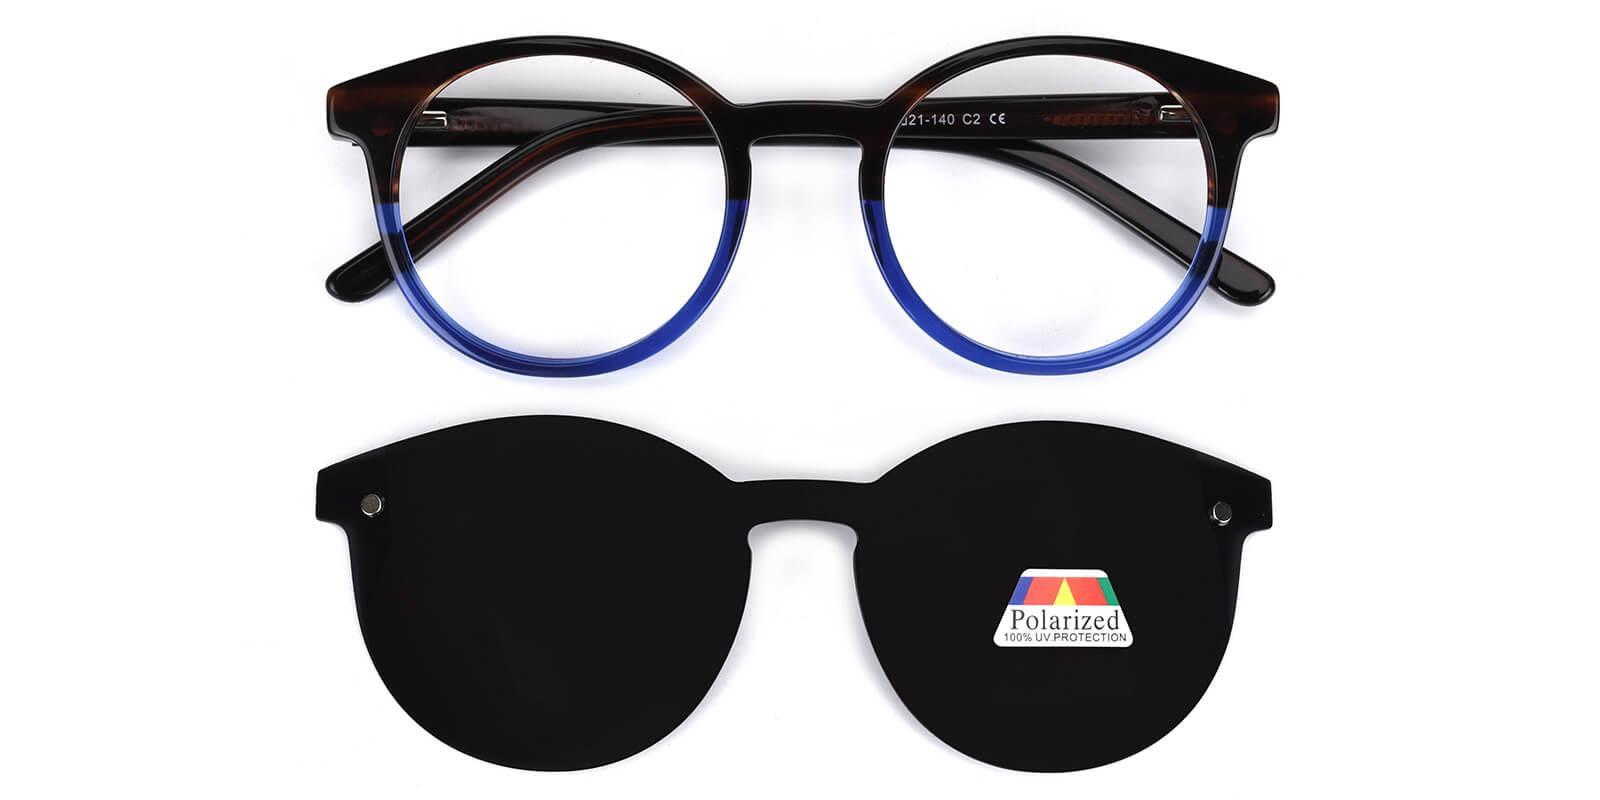 Chocolate-Multicolor-Round-Acetate-Eyeglasses-detail